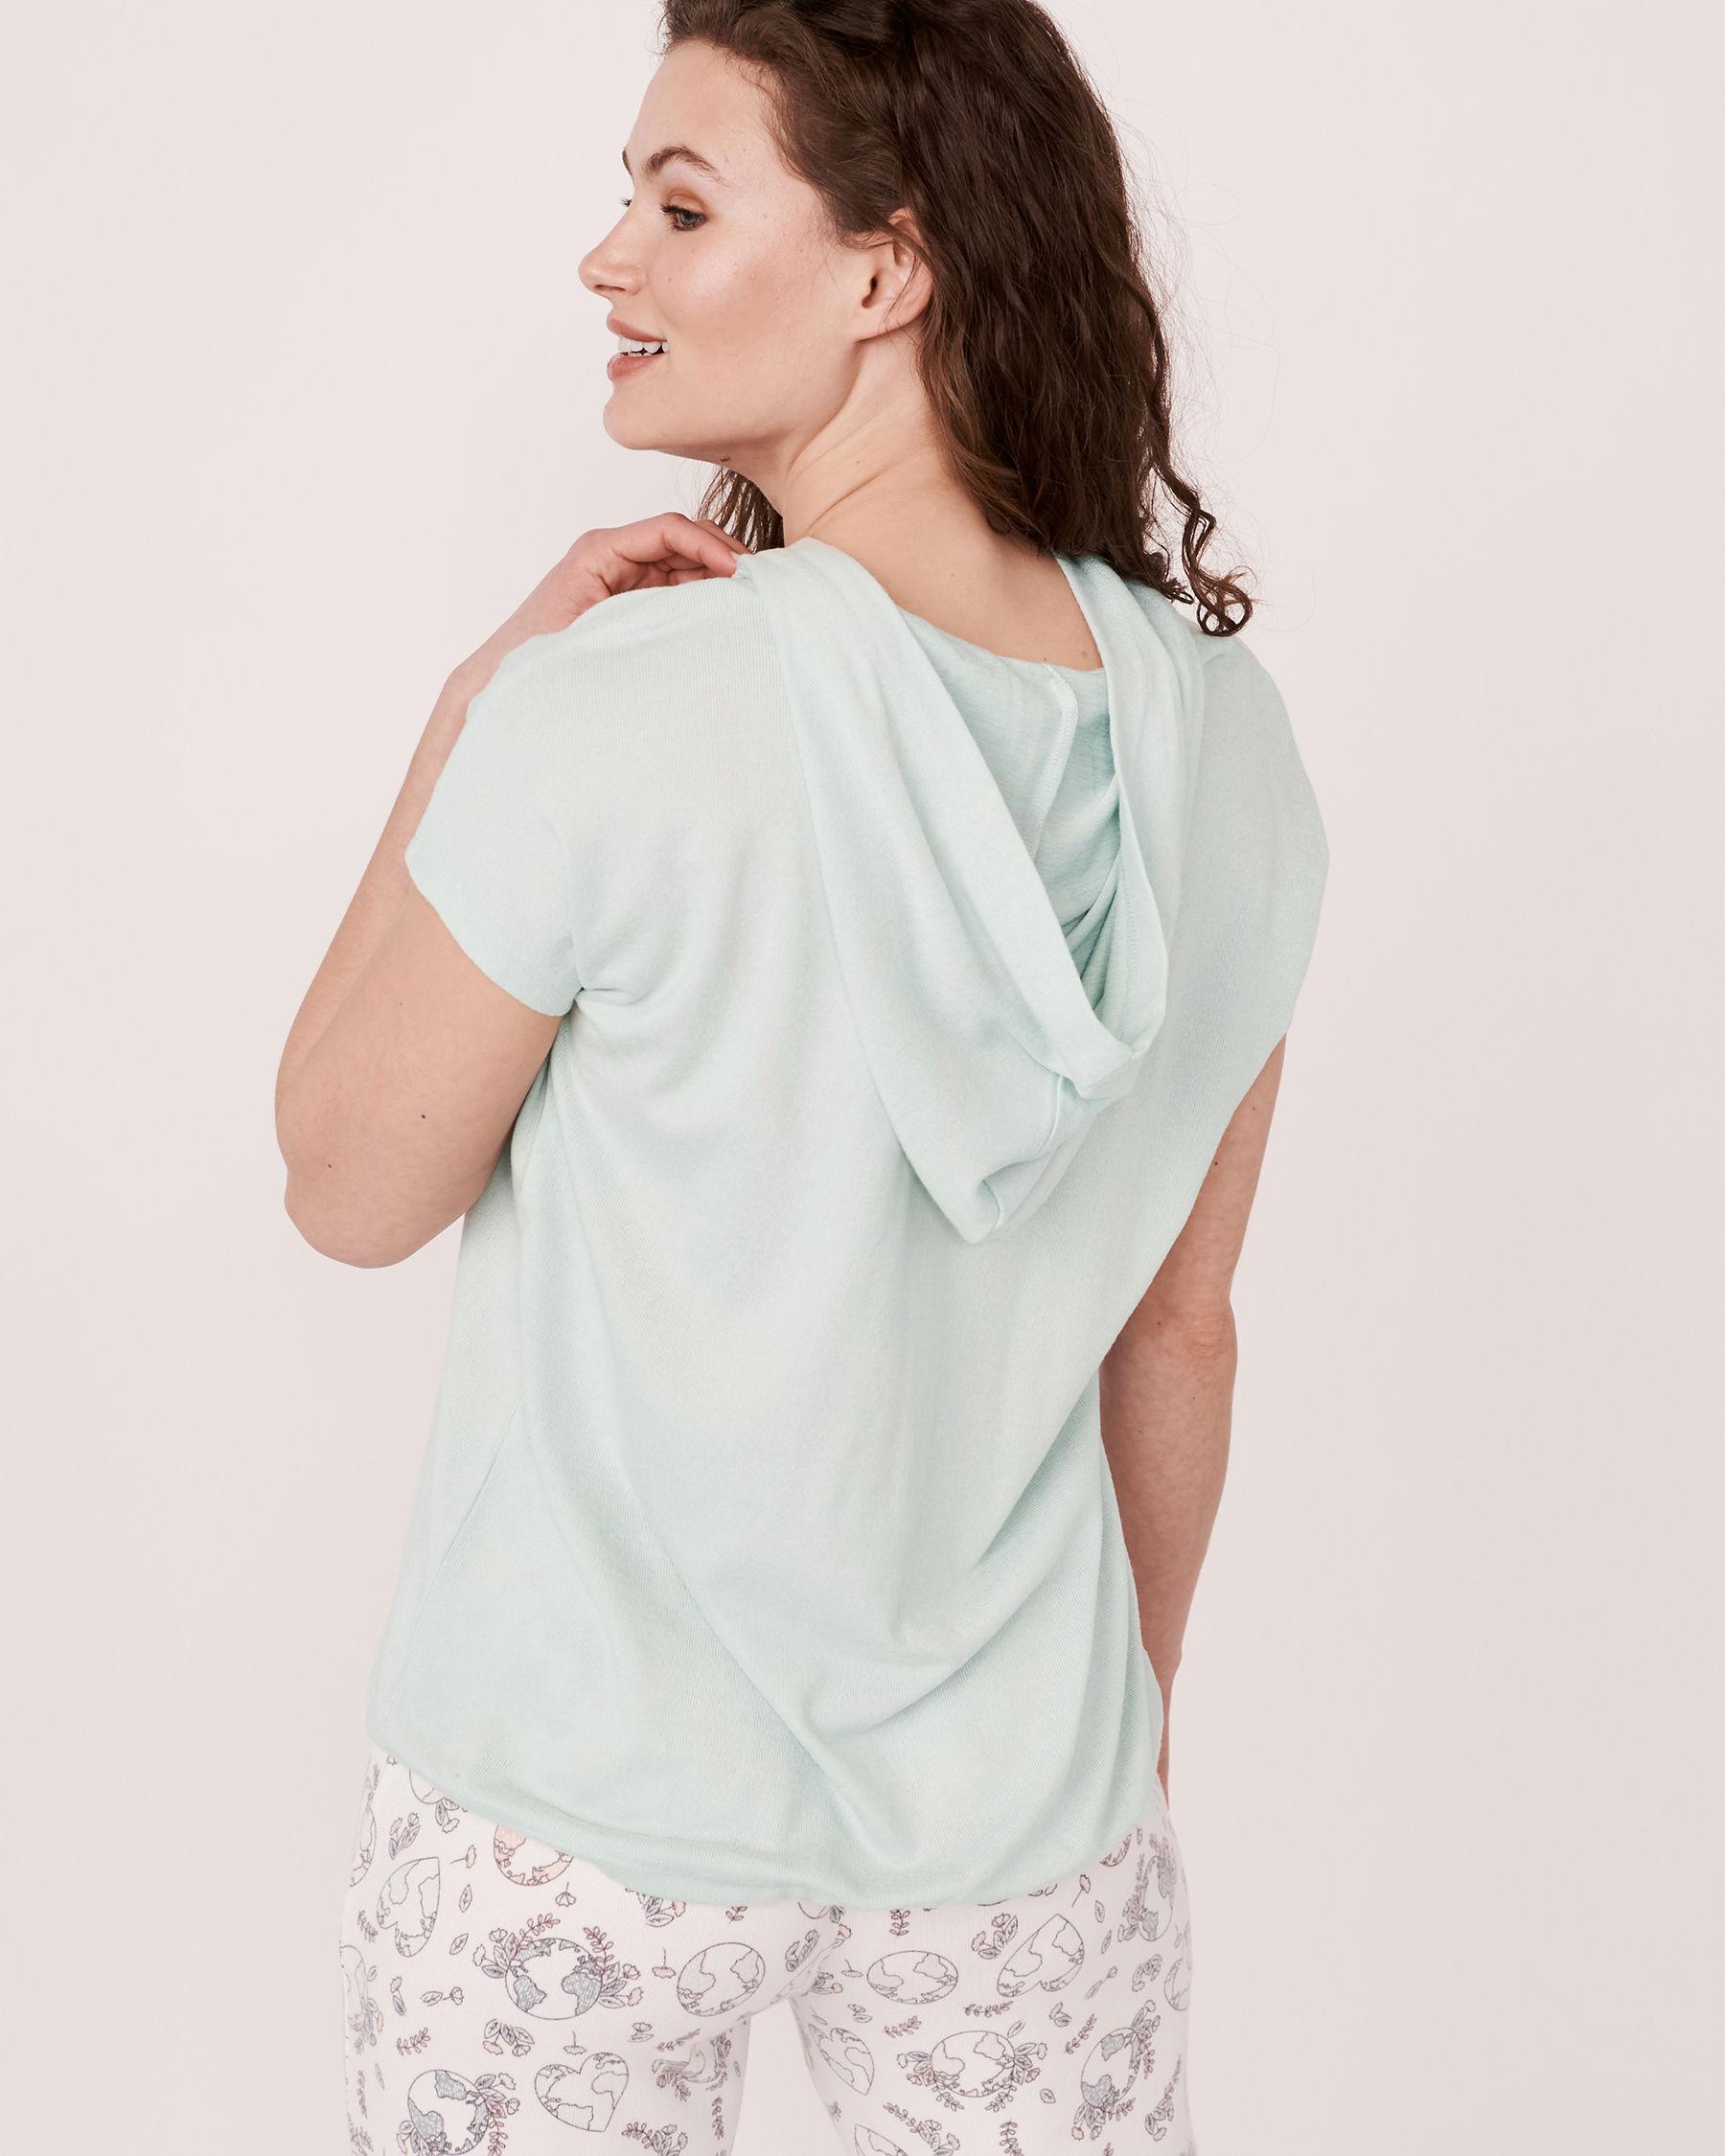 LA VIE EN ROSE Recycled Fibers Hooded T-shirt Blue mix 40100039 - View2